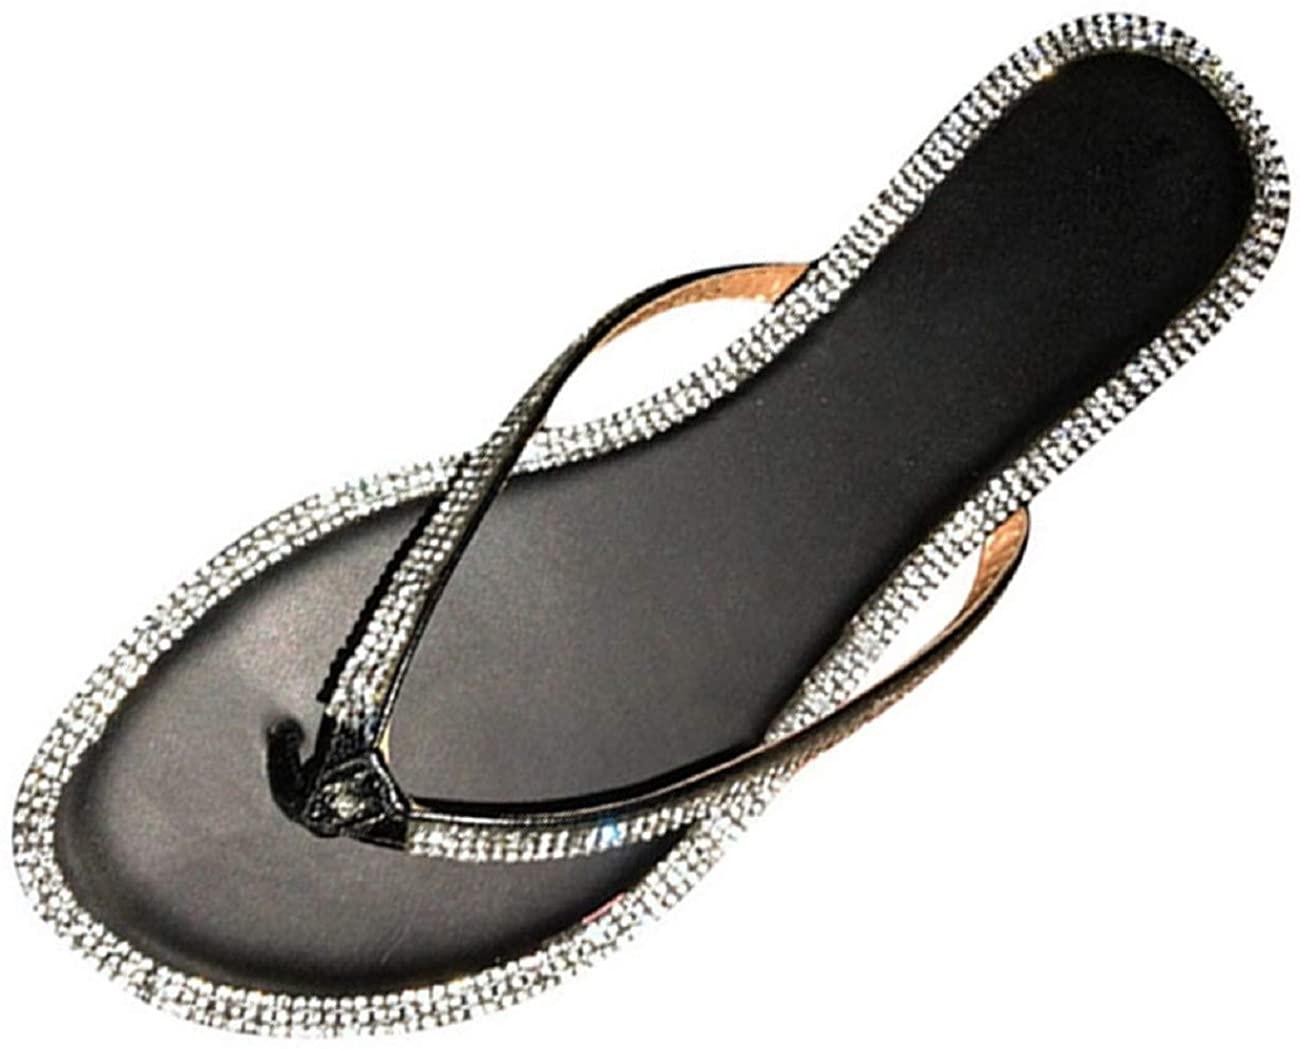 Tsmile Women's Rhinestone Glitter Slipper Lightweight Casual Beach Indoor Outdoor Crystal Flip Flop Toe Post Sandal